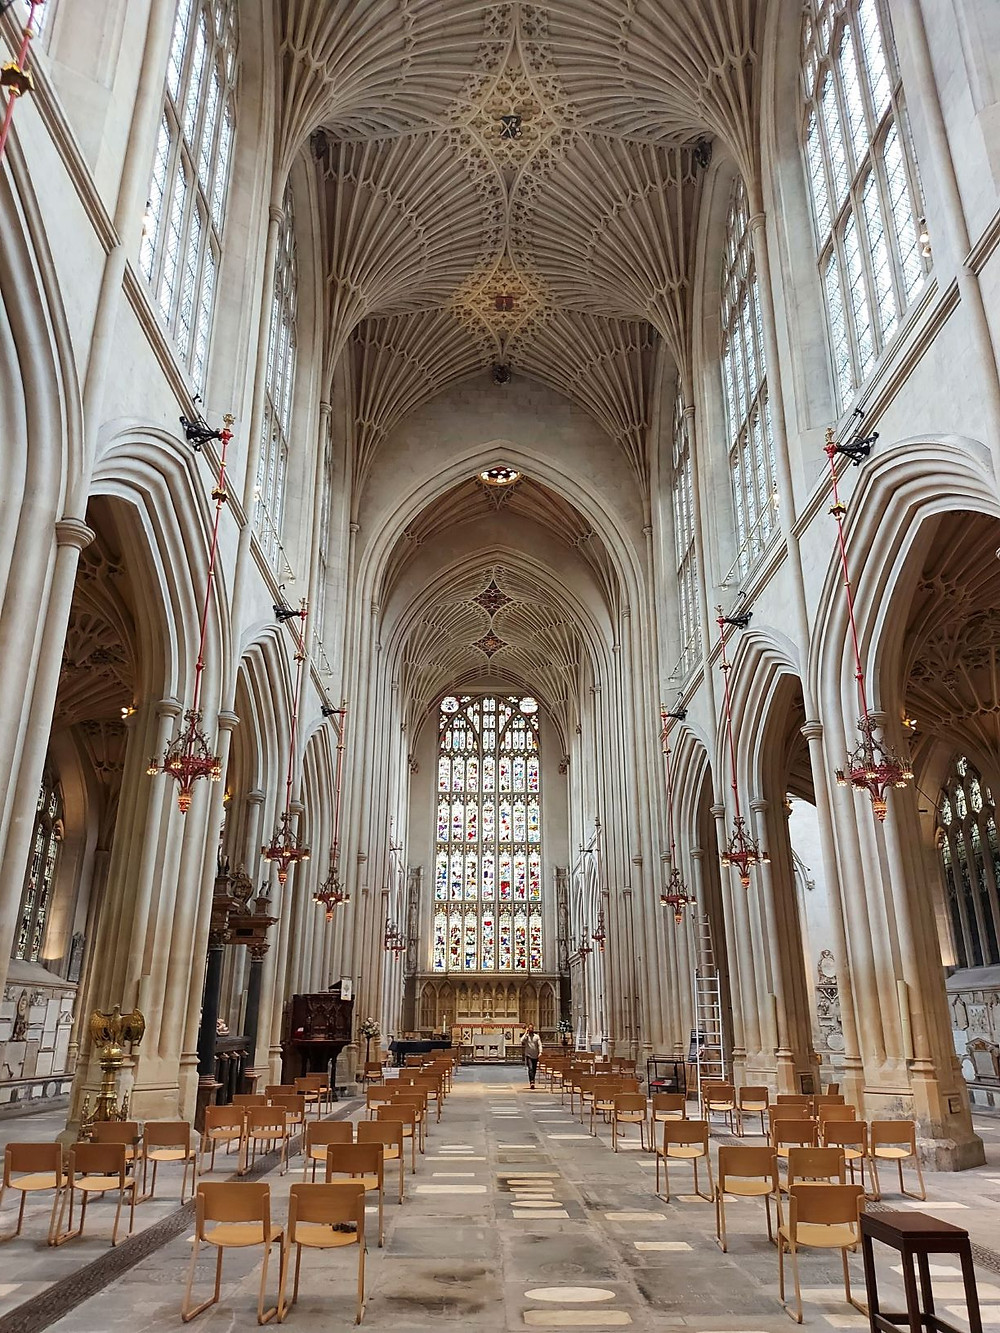 The interior of Bath's beautiful Abbey